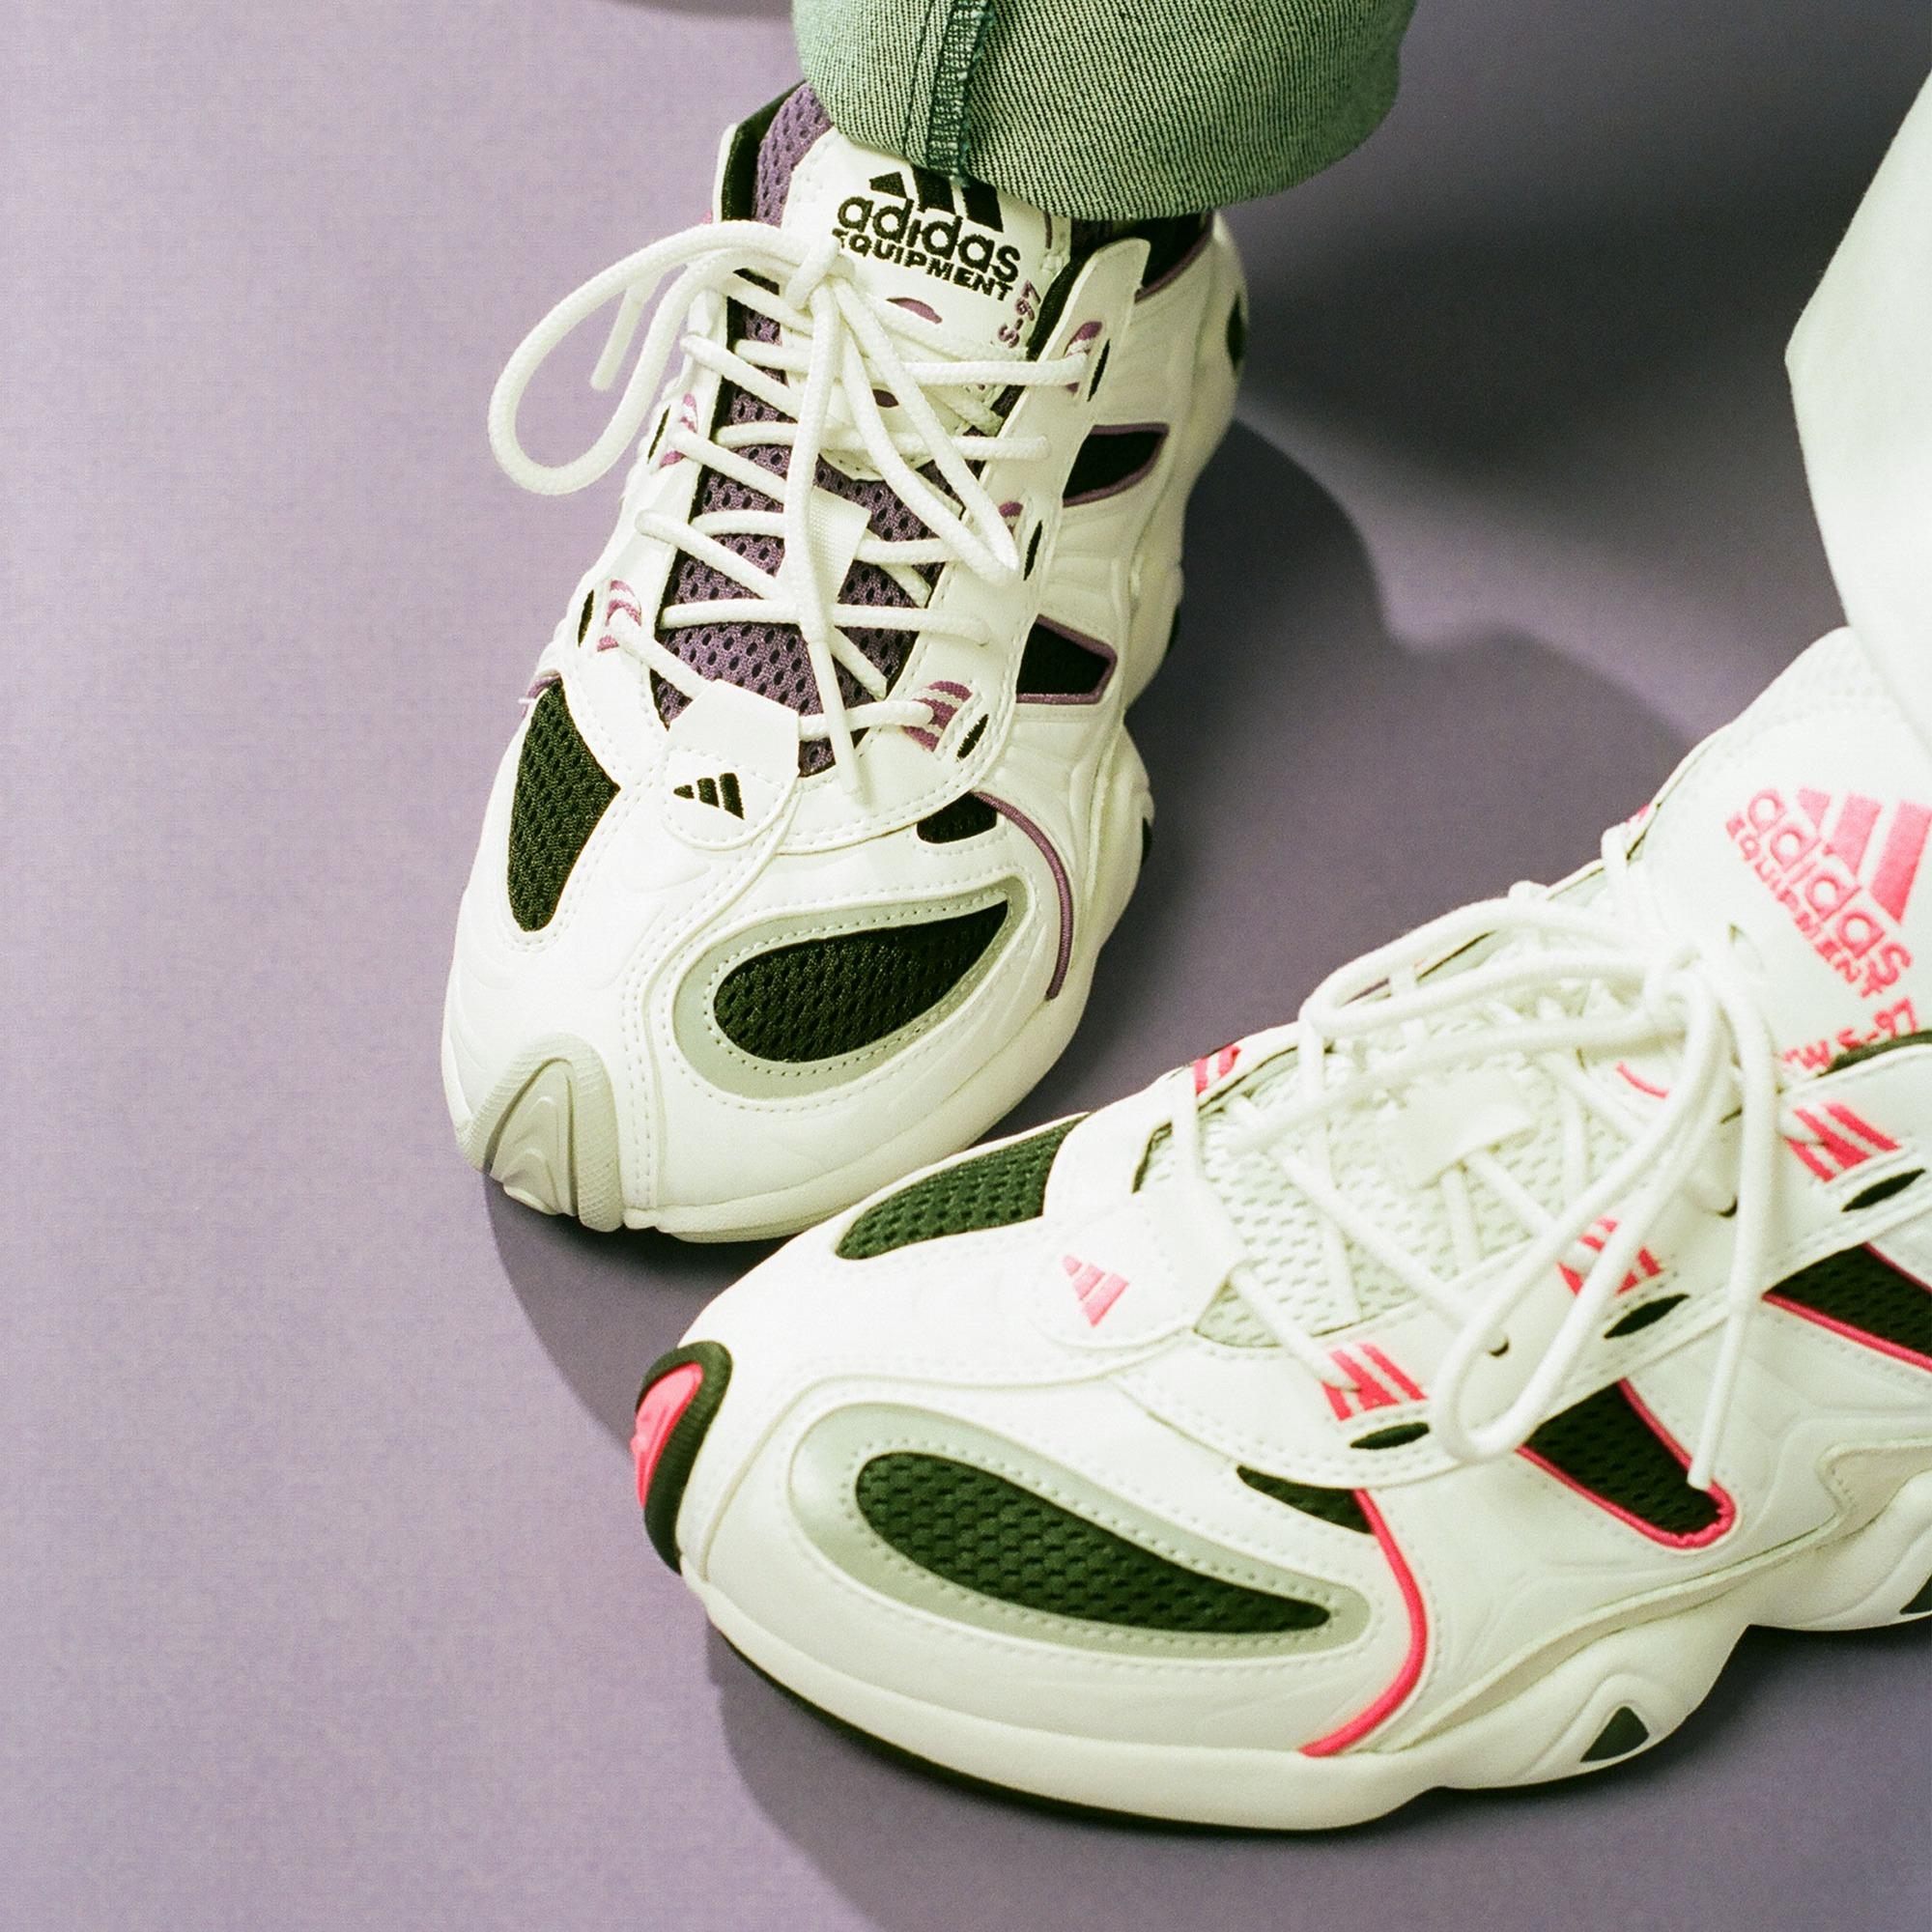 Editorials I Sneakers & Streetwear online seit 1999